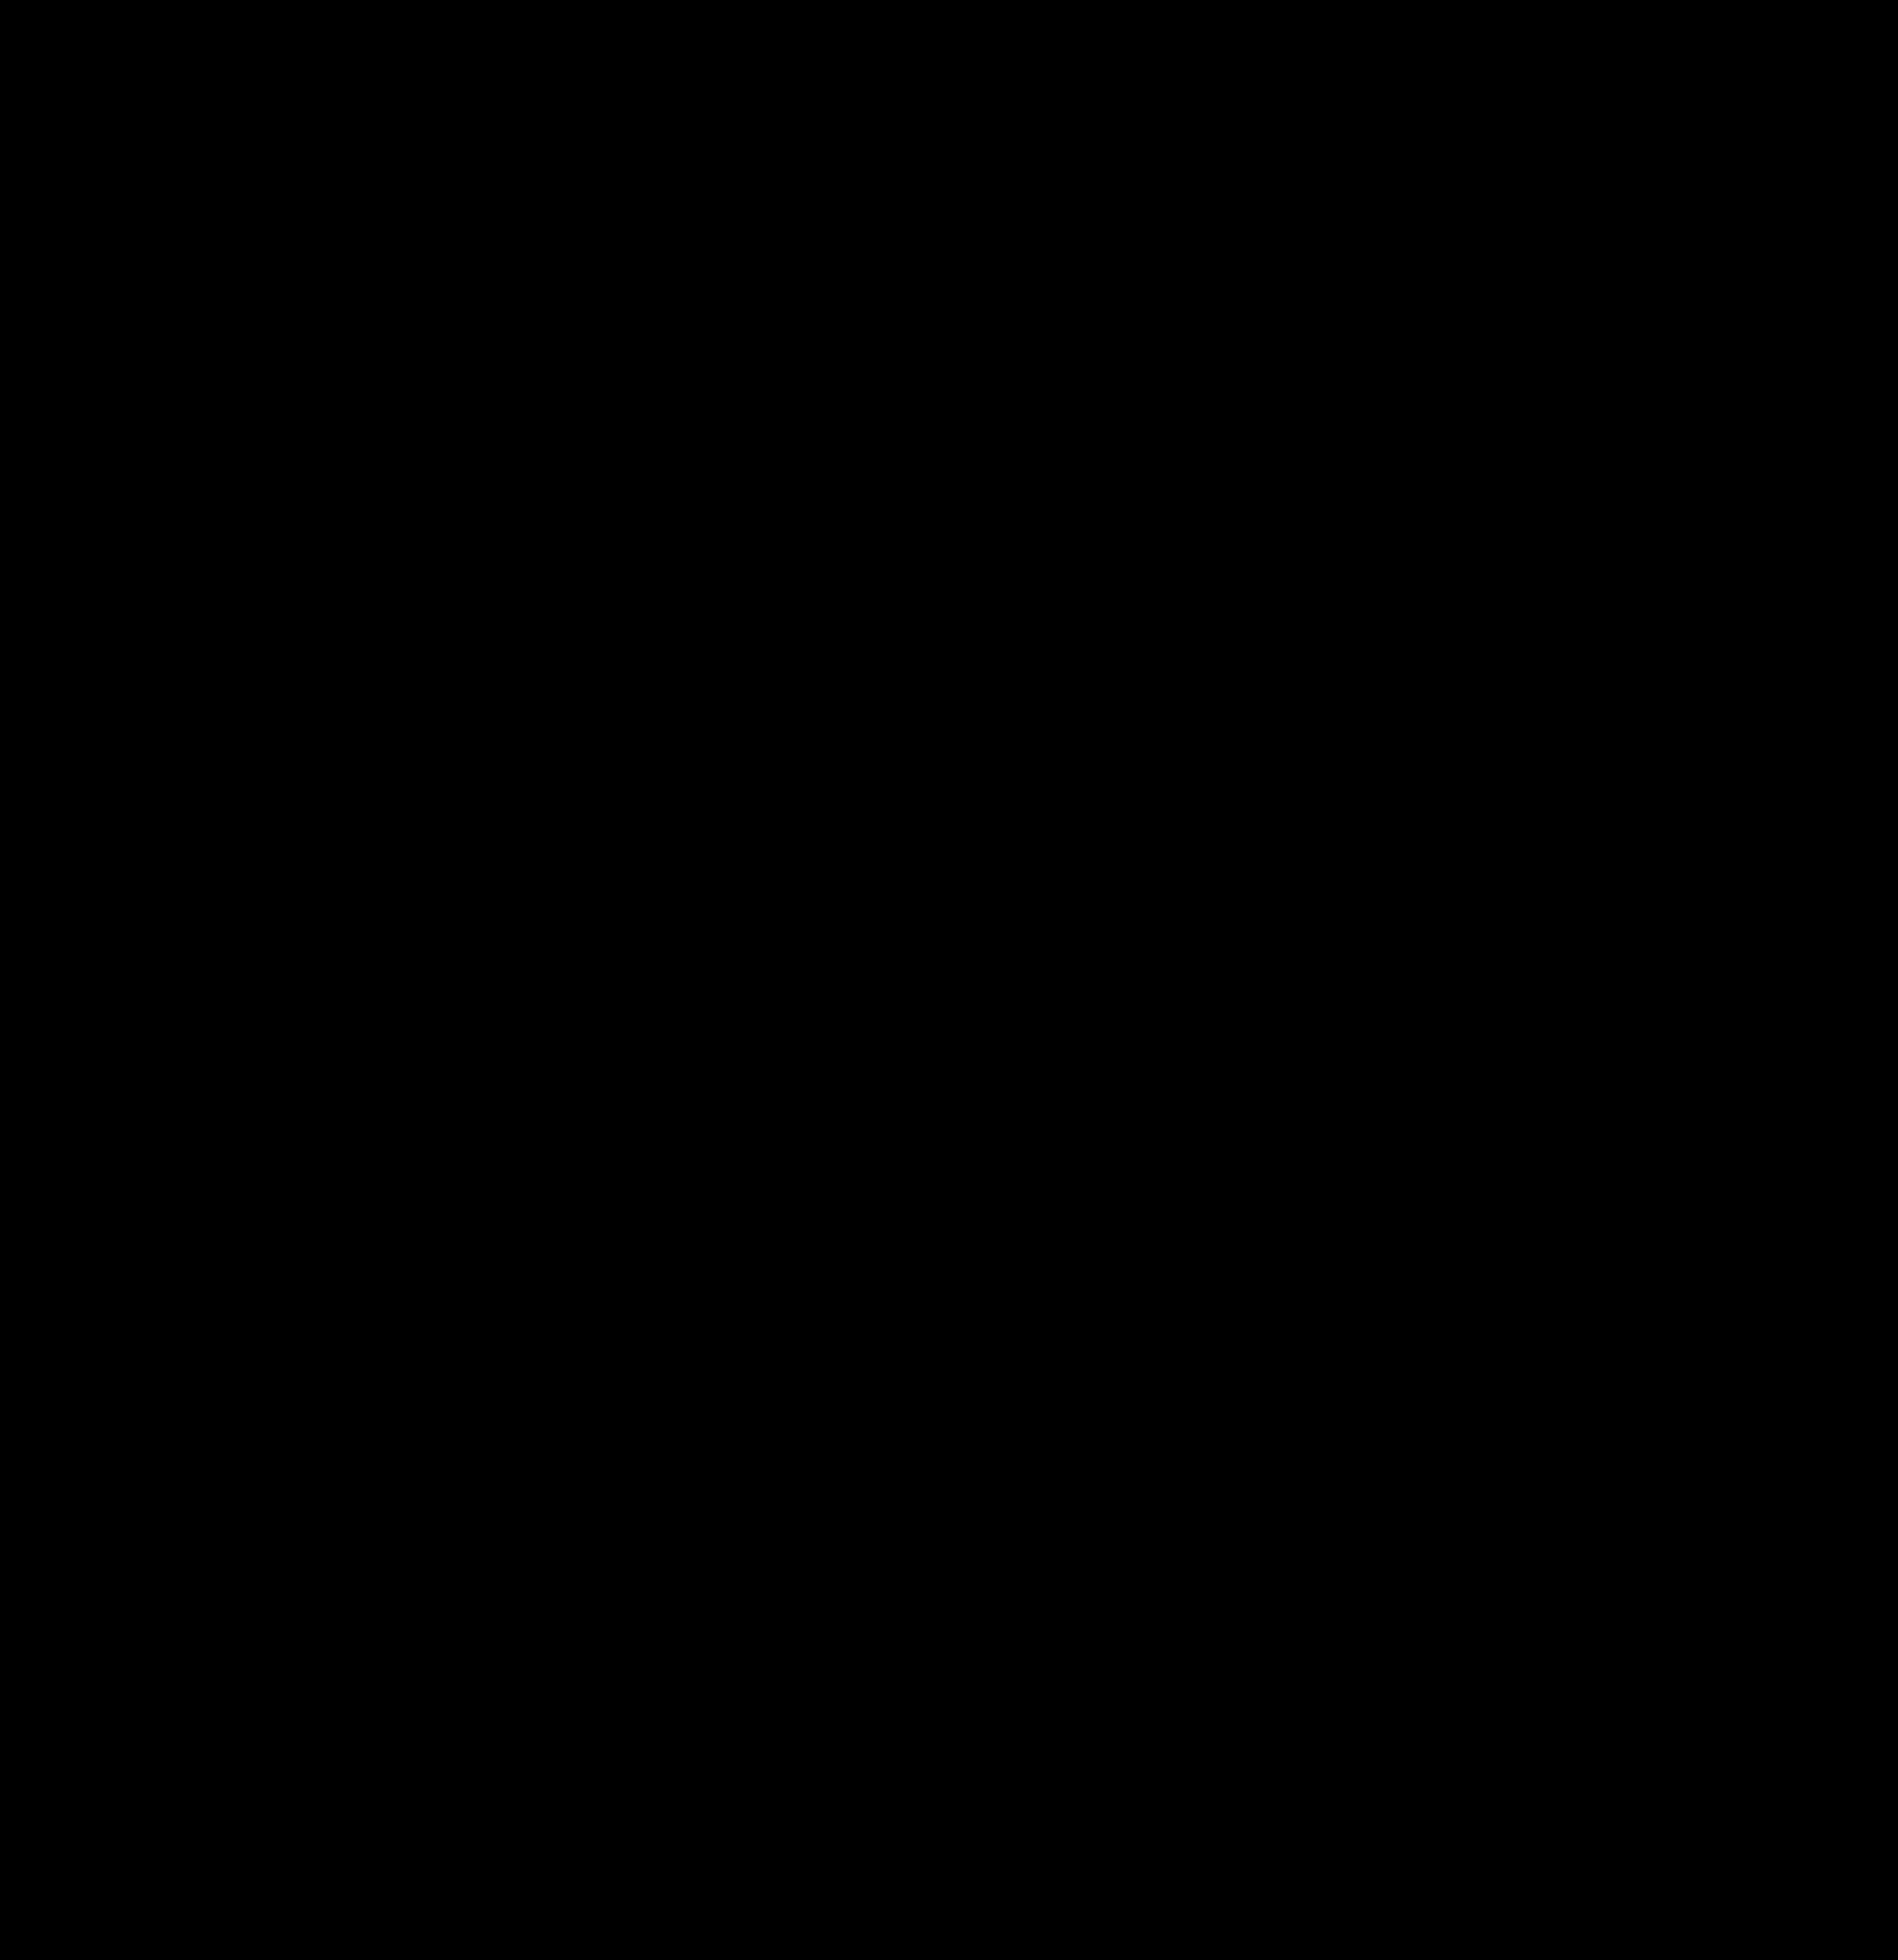 Clipart clock orange. A clockwork big image